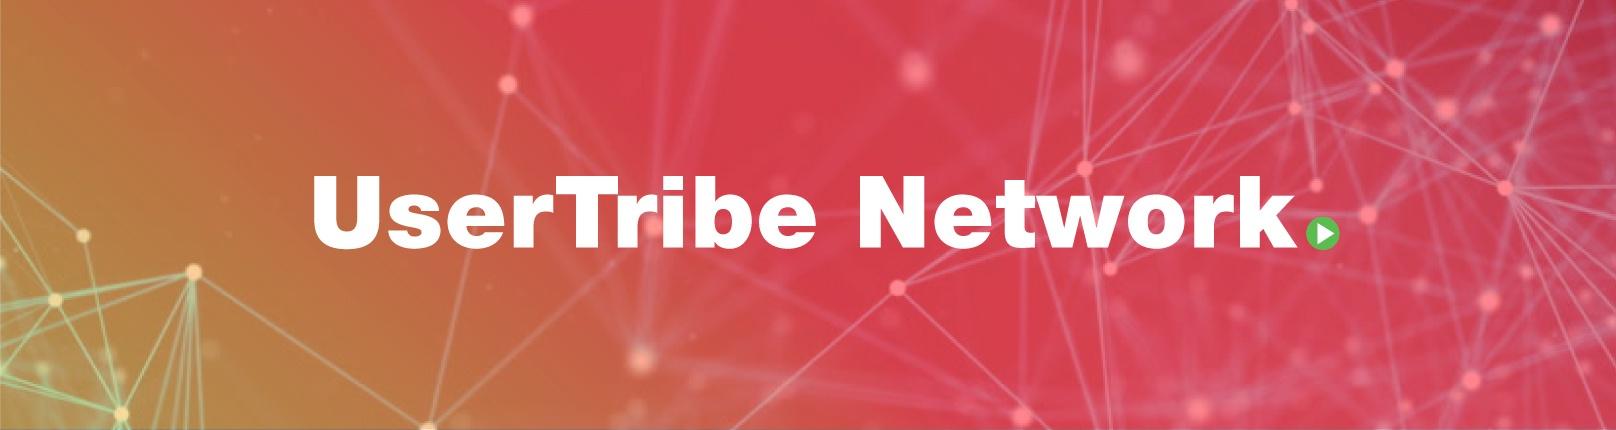 UserTribe Network